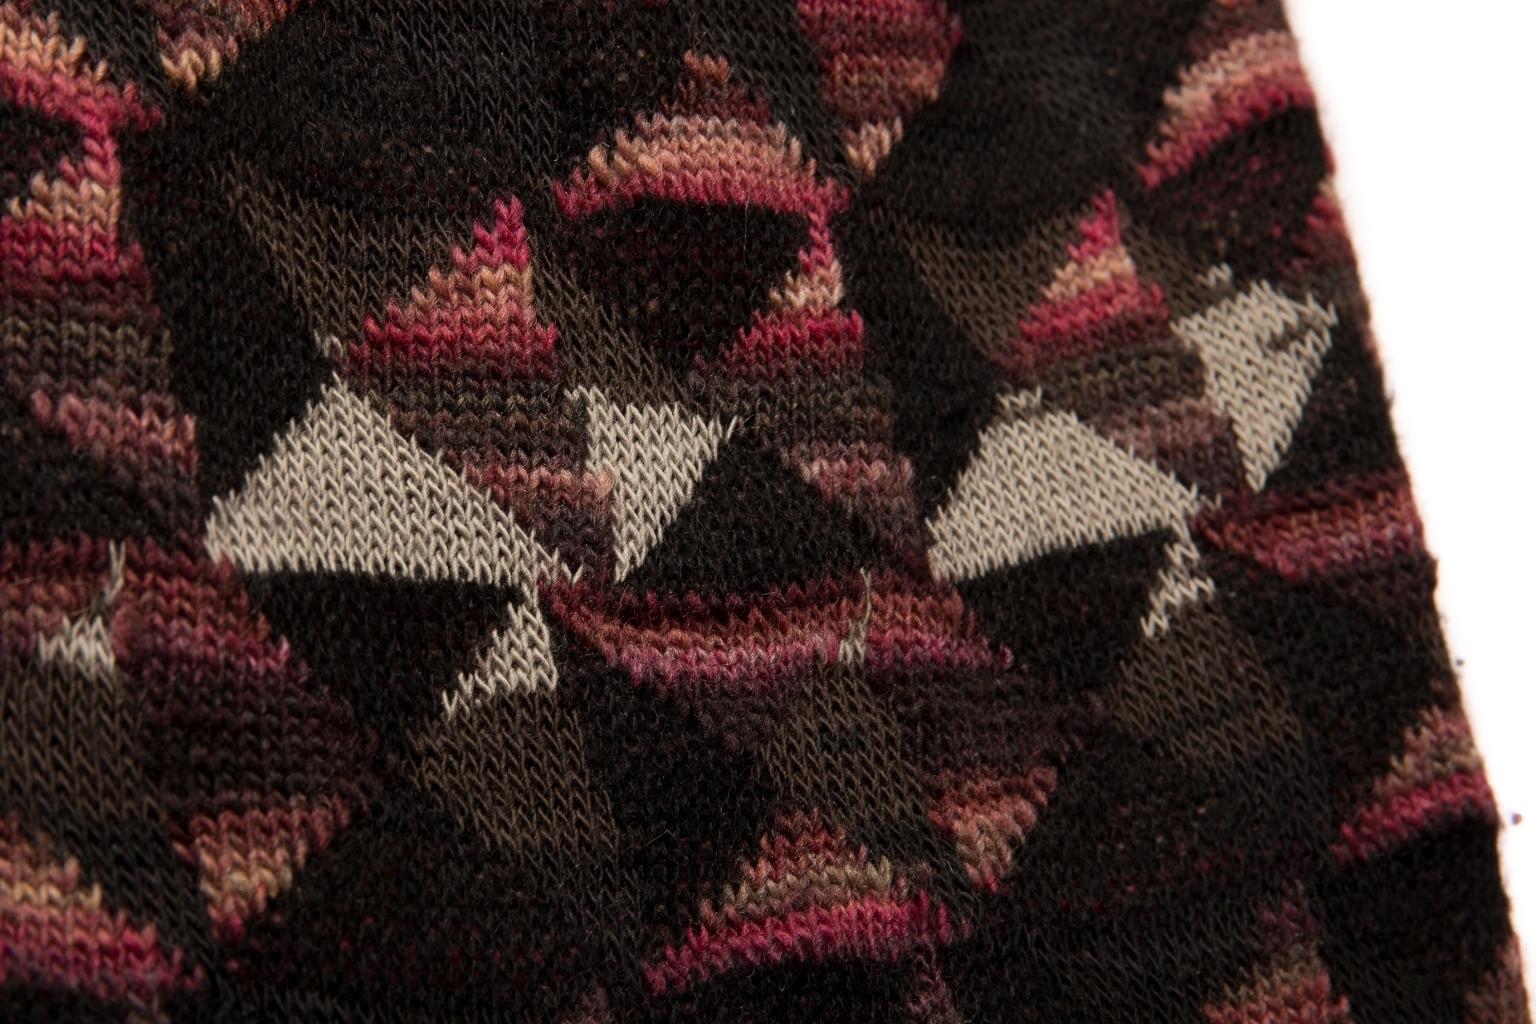 Красивая юбка из трикотажа с геометрическим рисунком от Chanel, 36 размер.